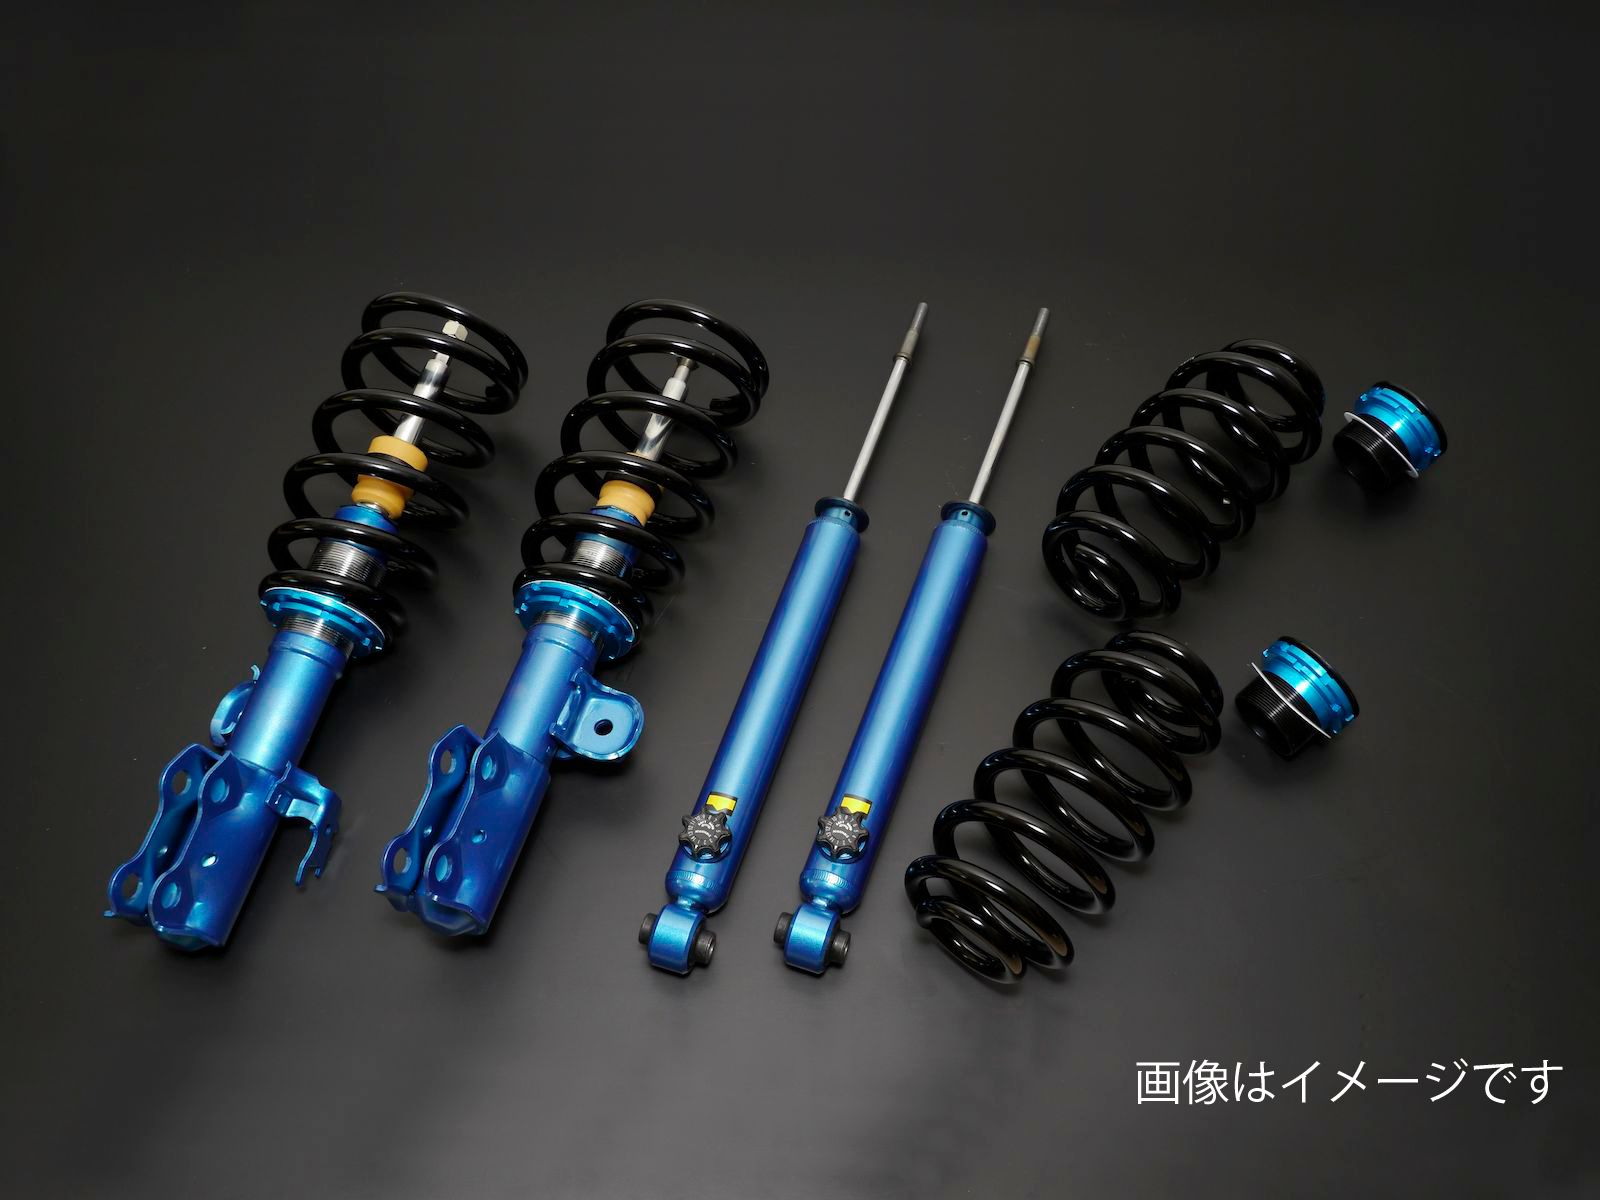 CUSCO(クスコ) 車高調キット street トヨタ エスティマ ACR30W/MCR30W 2000.1-2005.12 商品番号:813 62K CBF